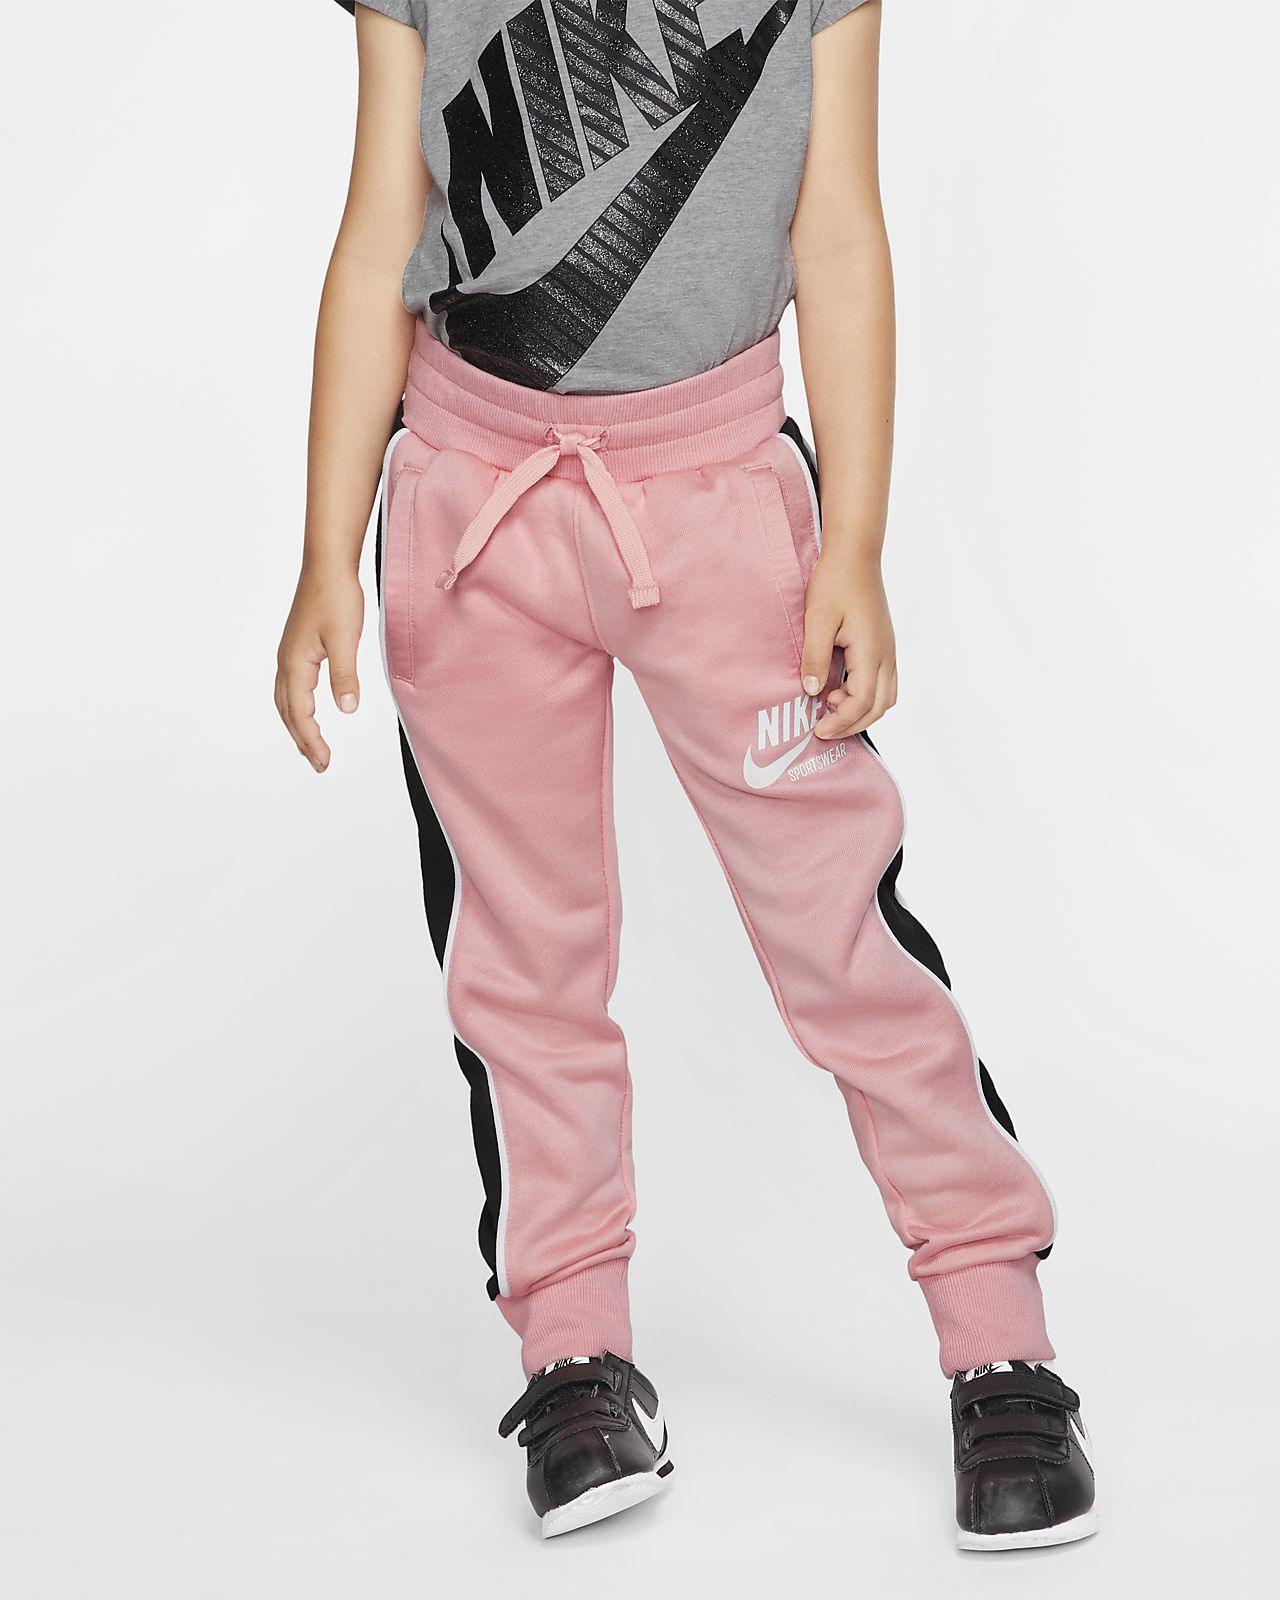 Pantalon de jogging Nike Sportswear pour Jeune enfant